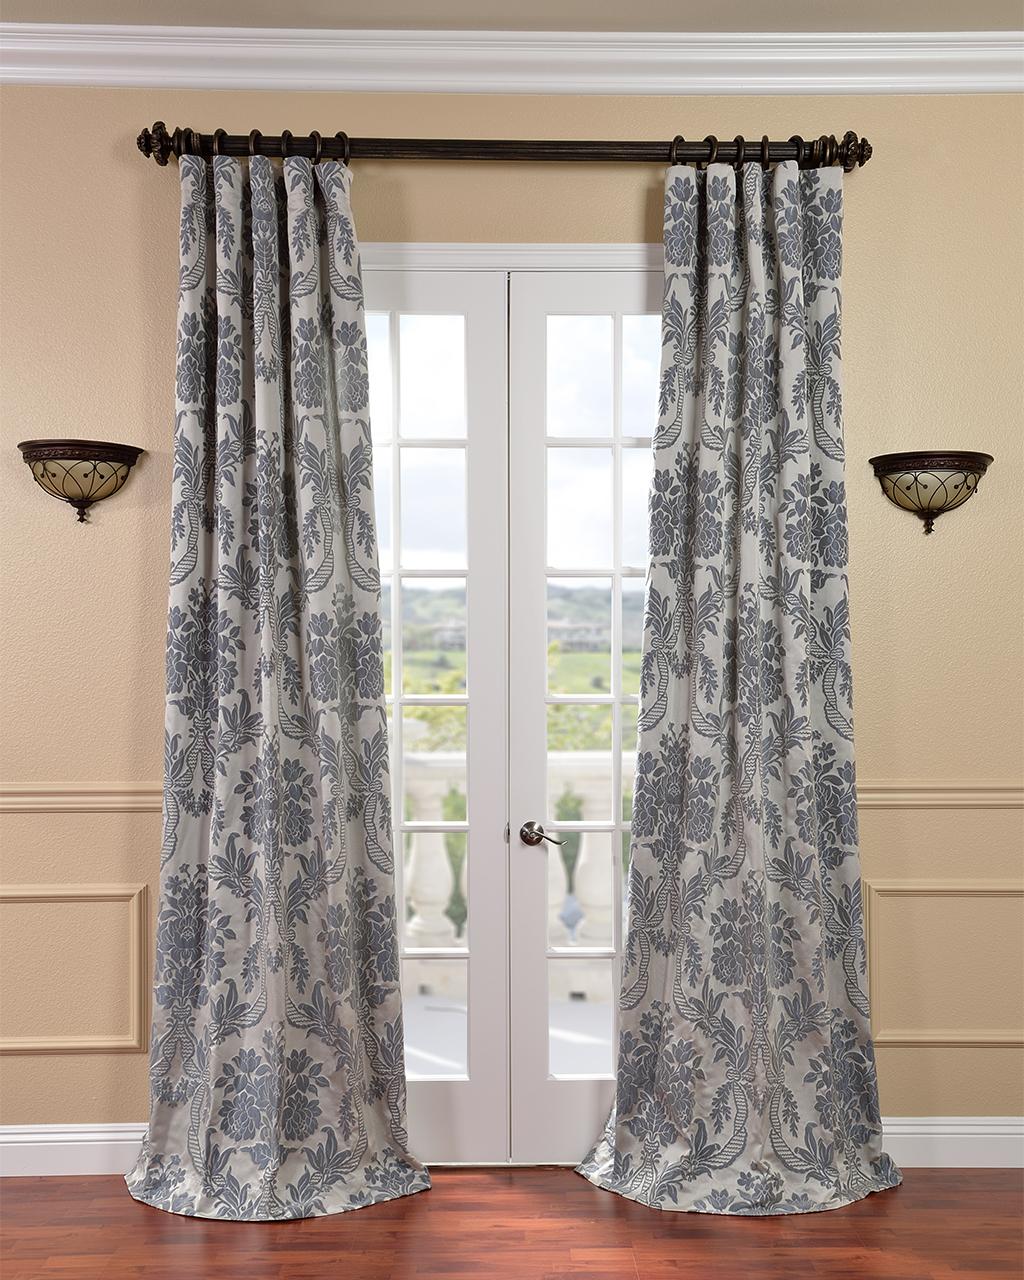 Elegant Curtain Ideas Tie Backs Curtains And Drapes Designs